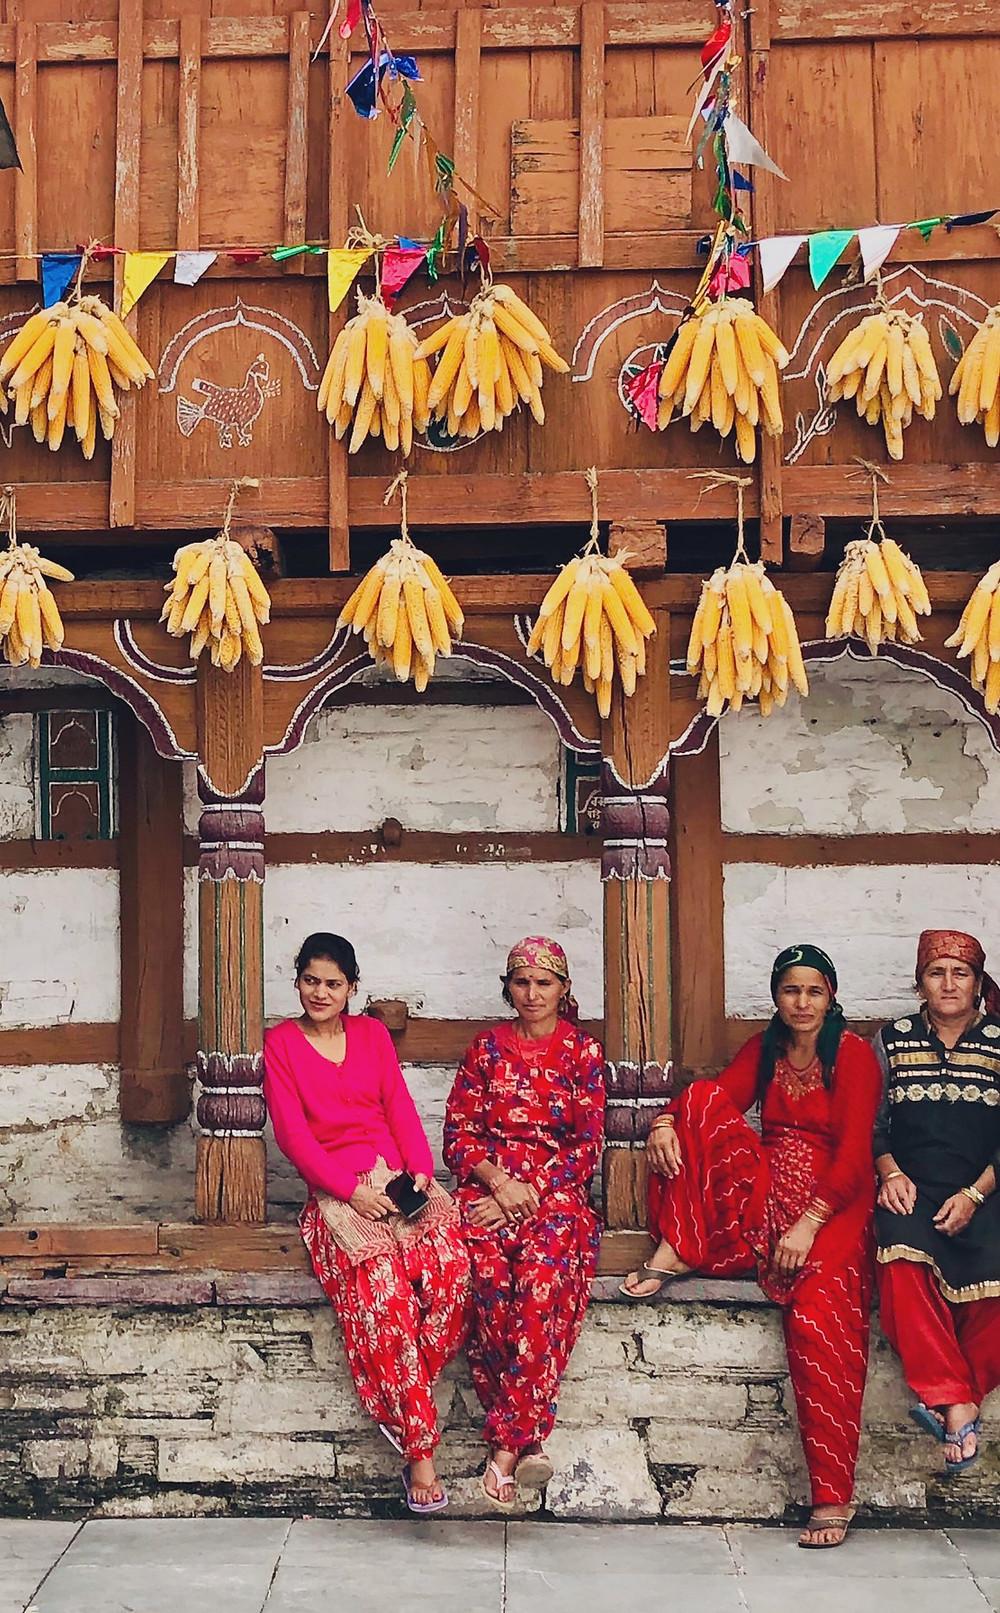 Women chatting in Sainji Village